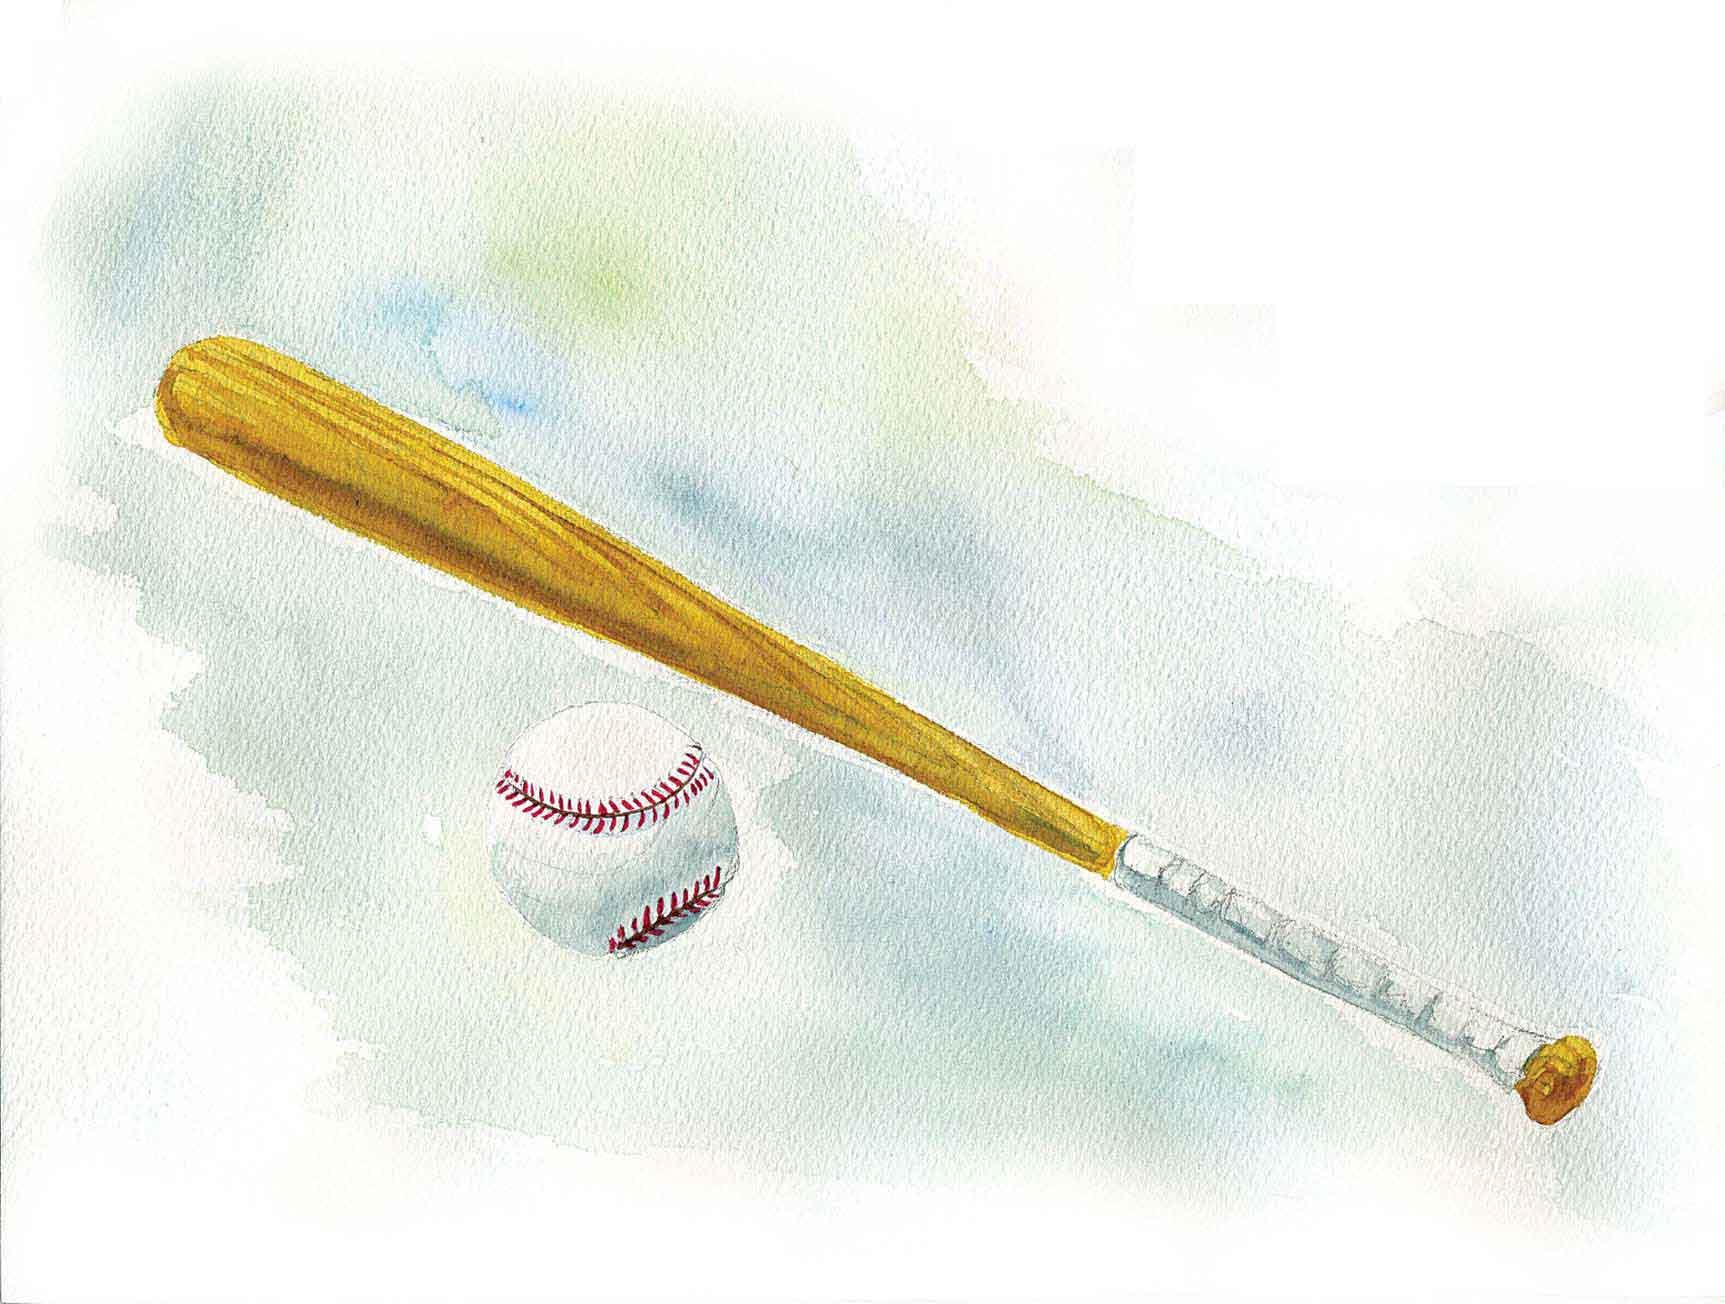 1_Online_baseball-bat